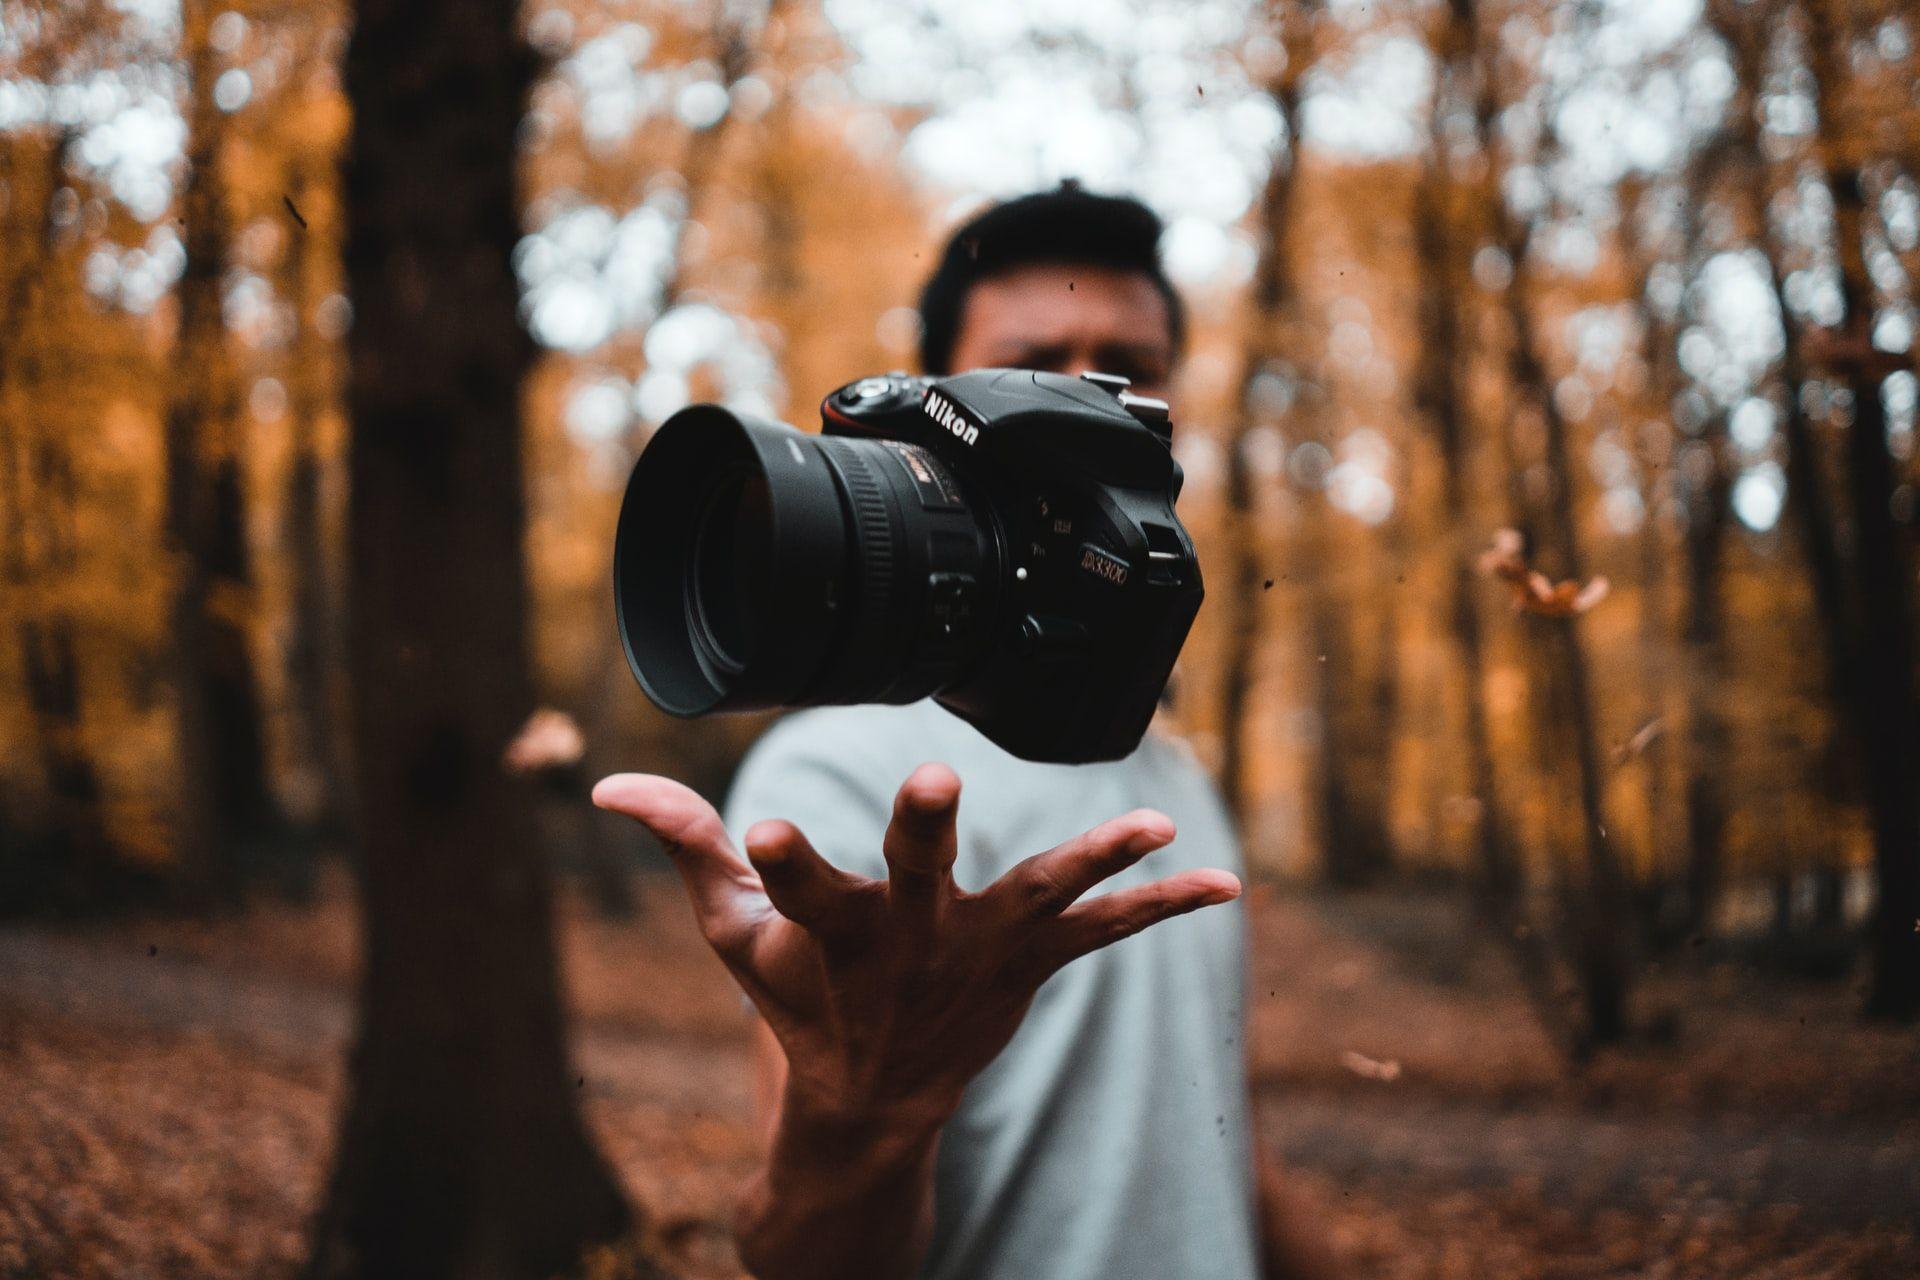 photographers on instagram